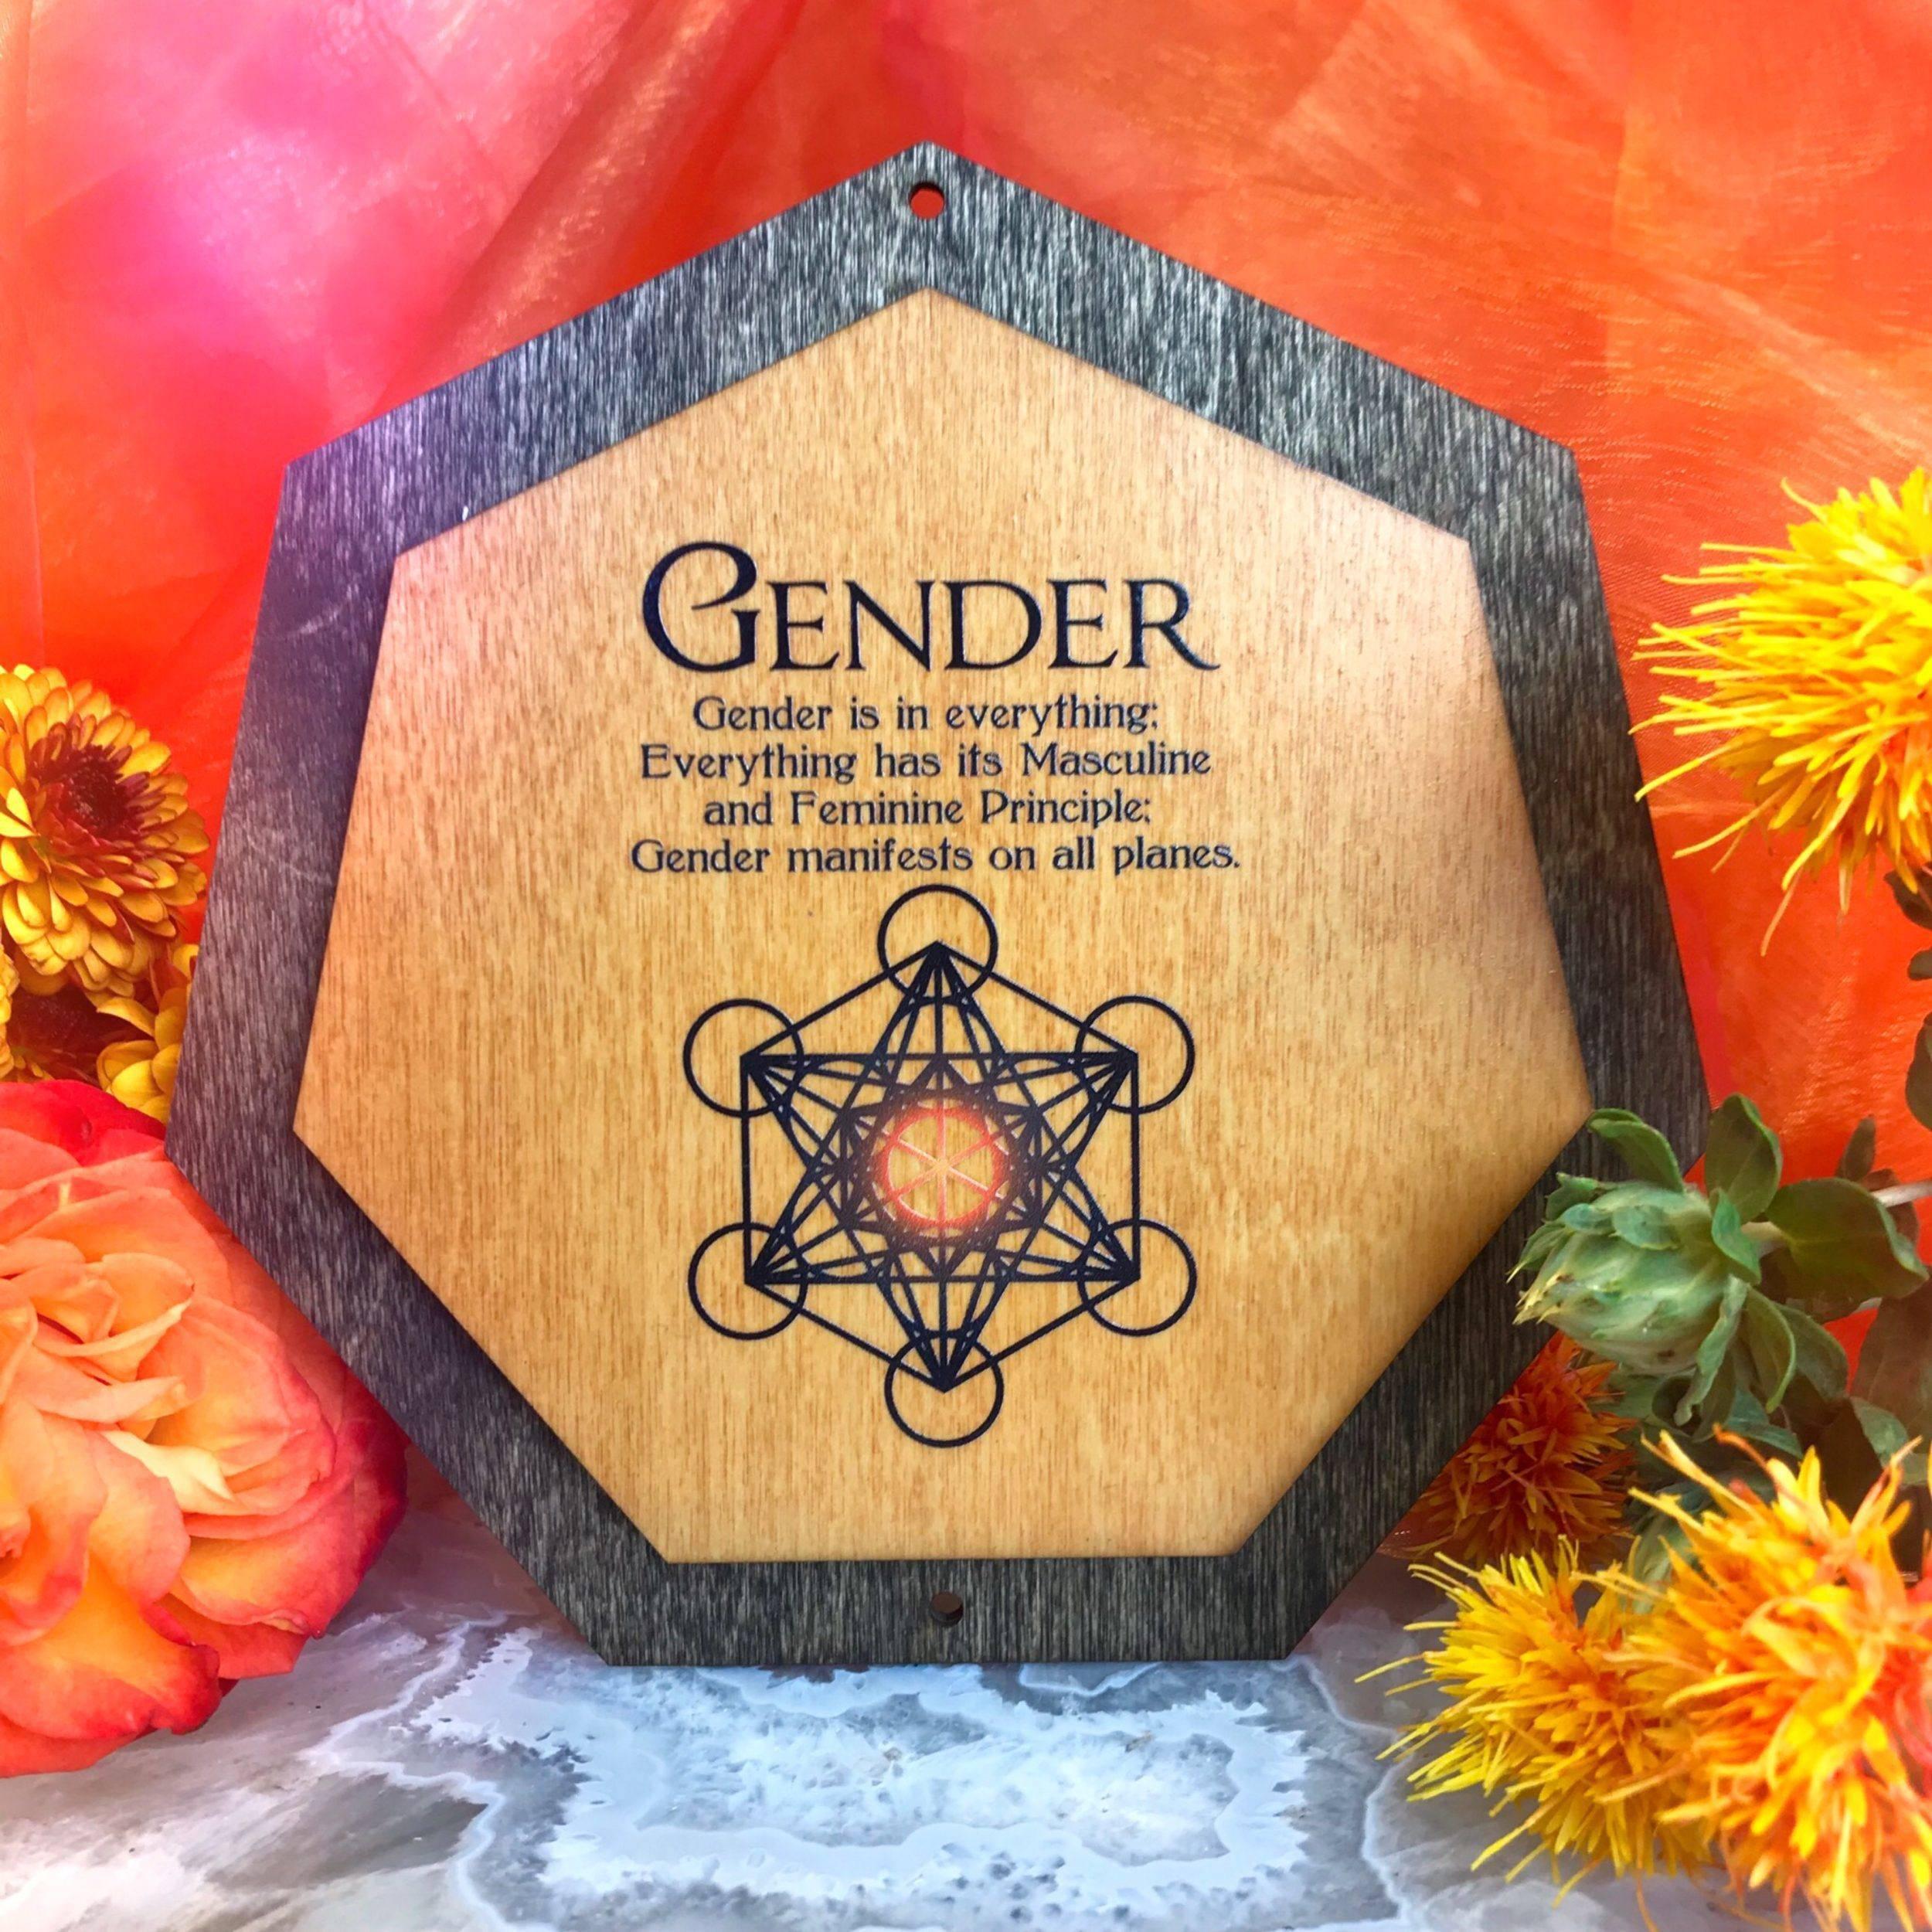 Hermetic_Principles_MOM_Gender_2of5_10_1